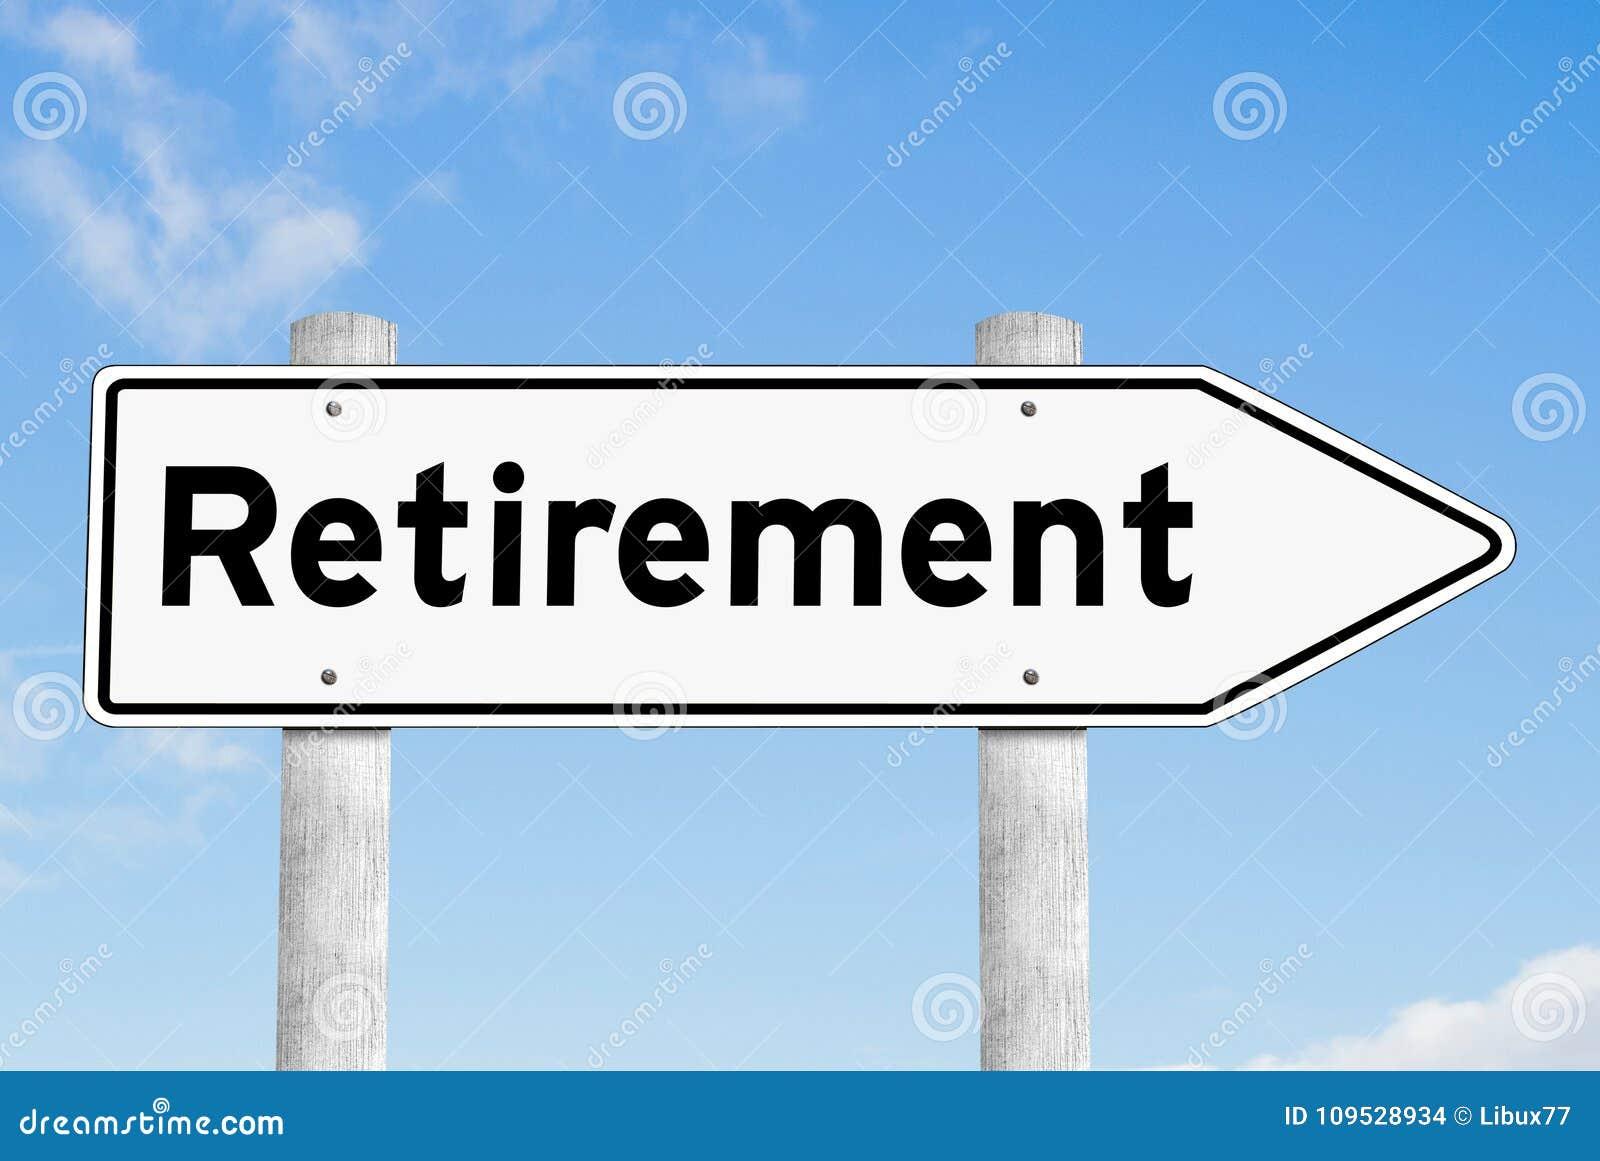 Retirement signpost direction sky